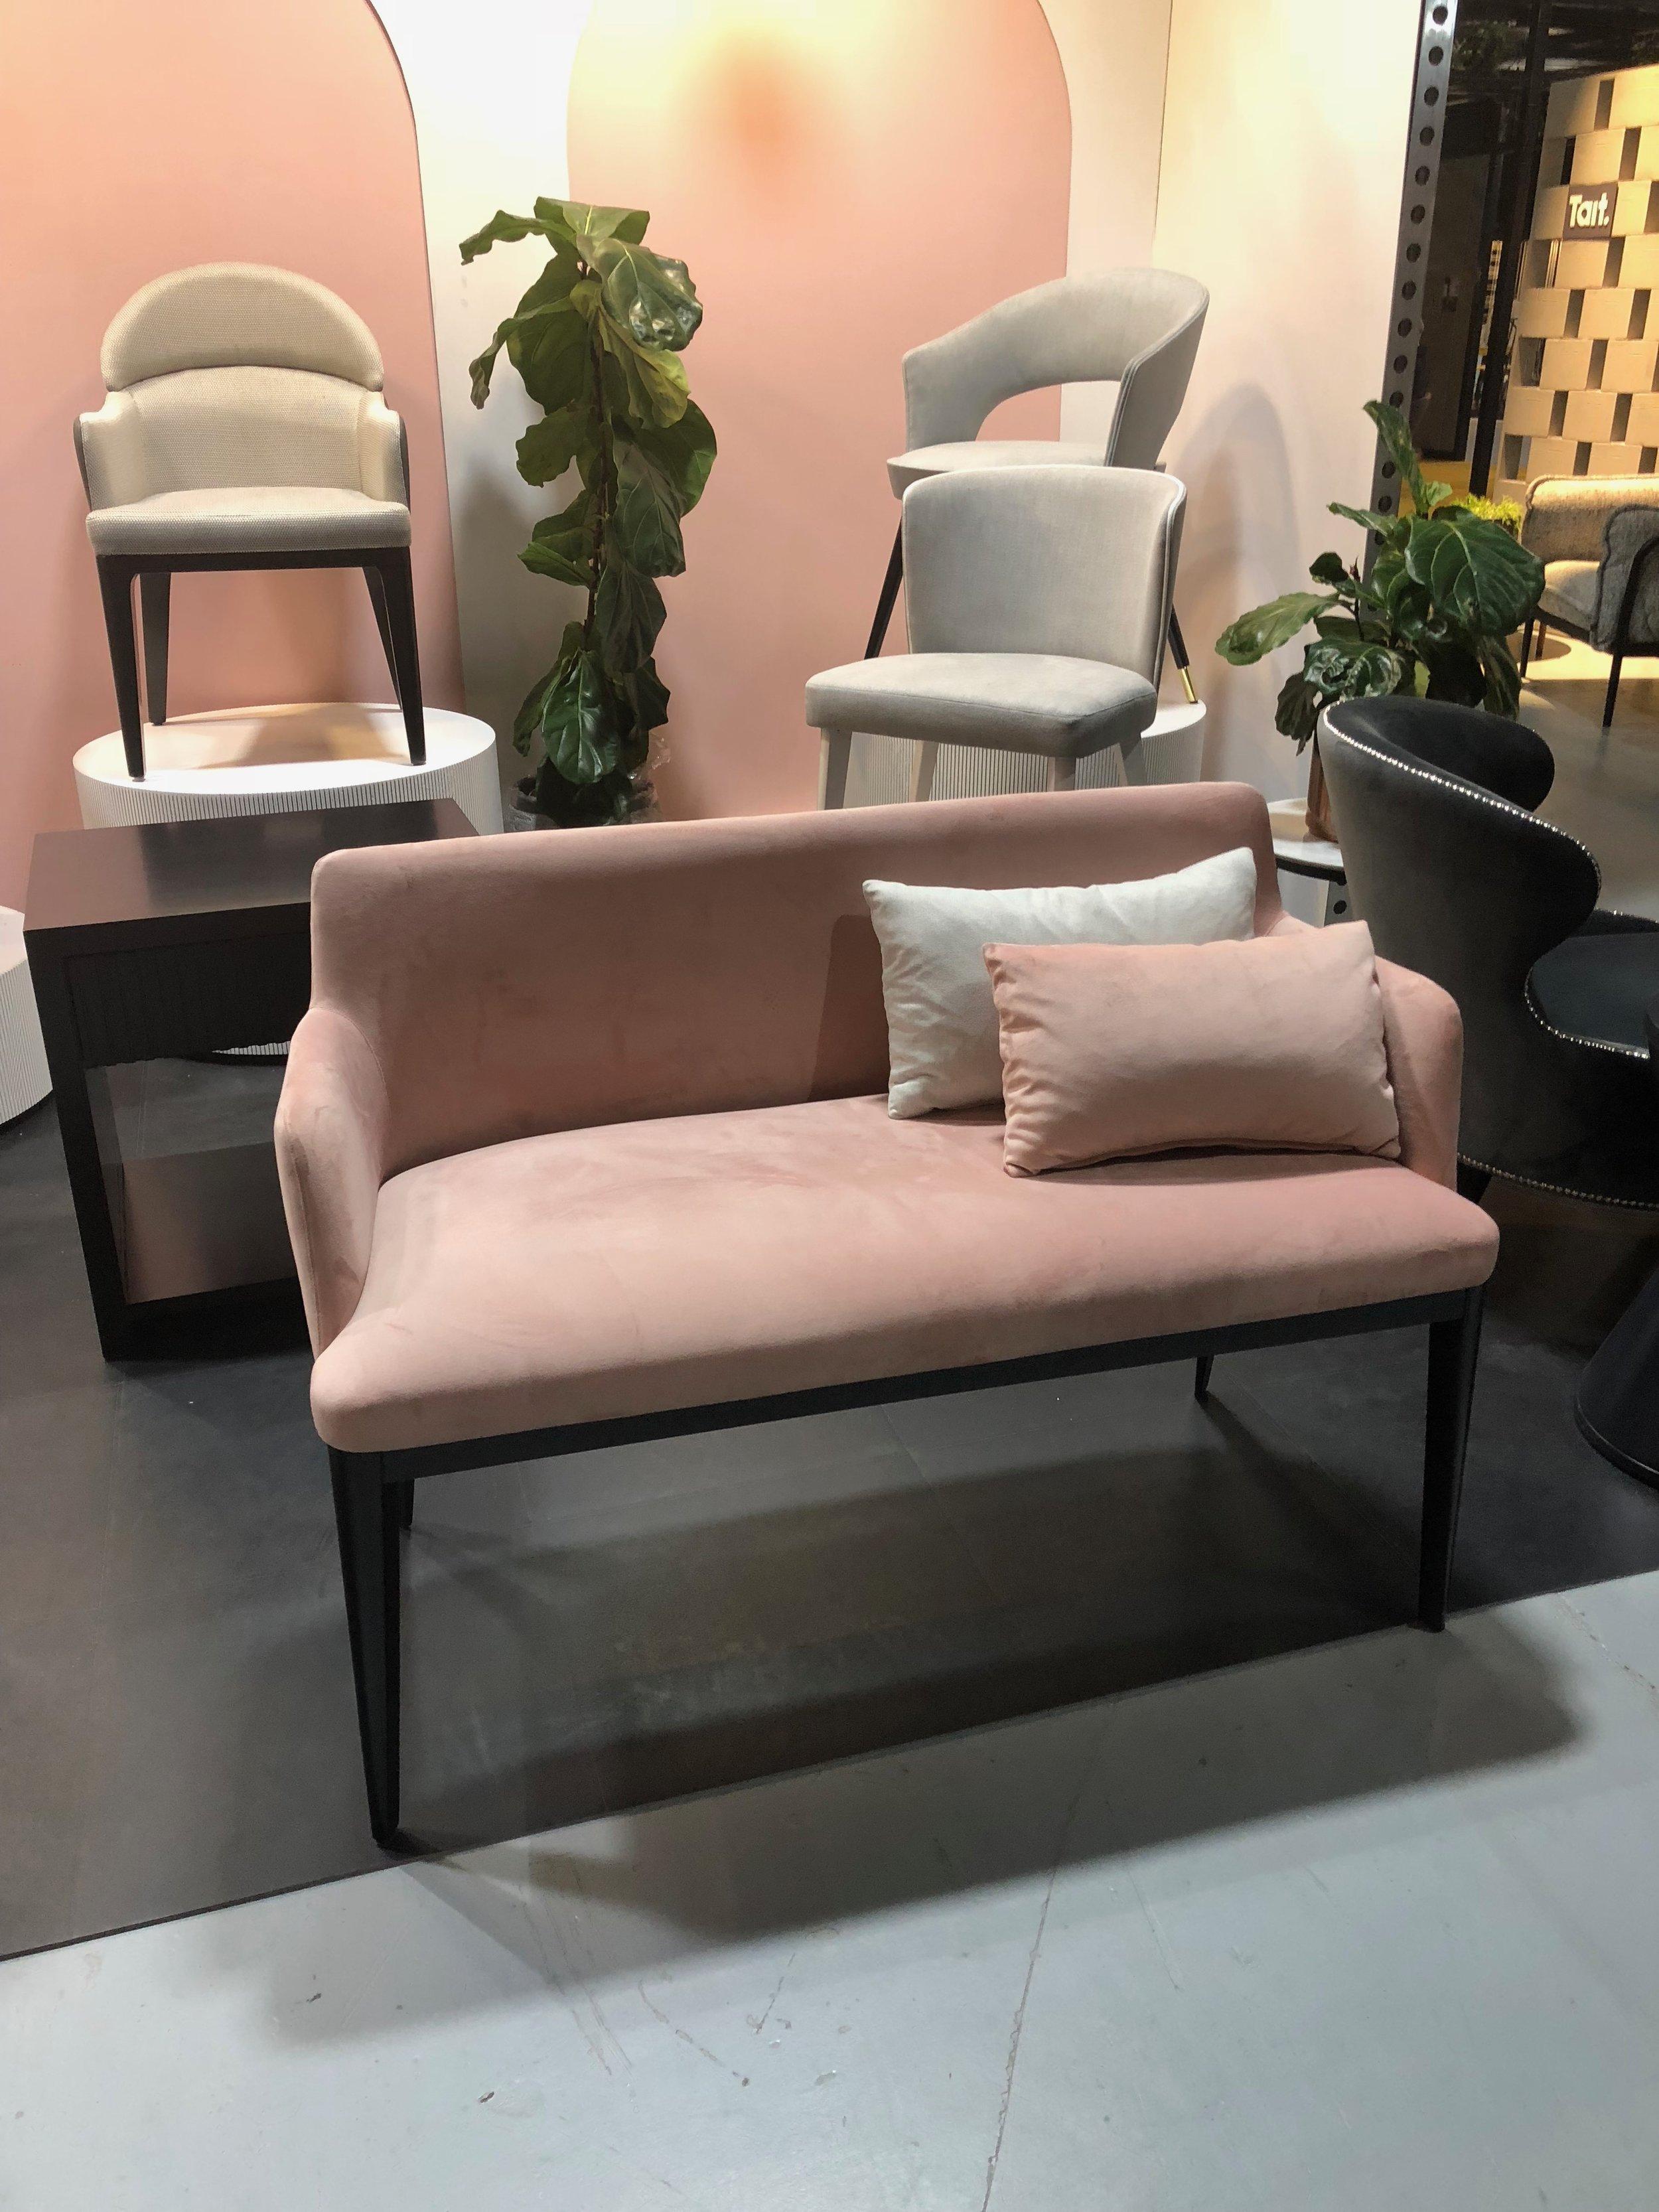 Casa Mia display showcasing their new Aver lounge #LOVE